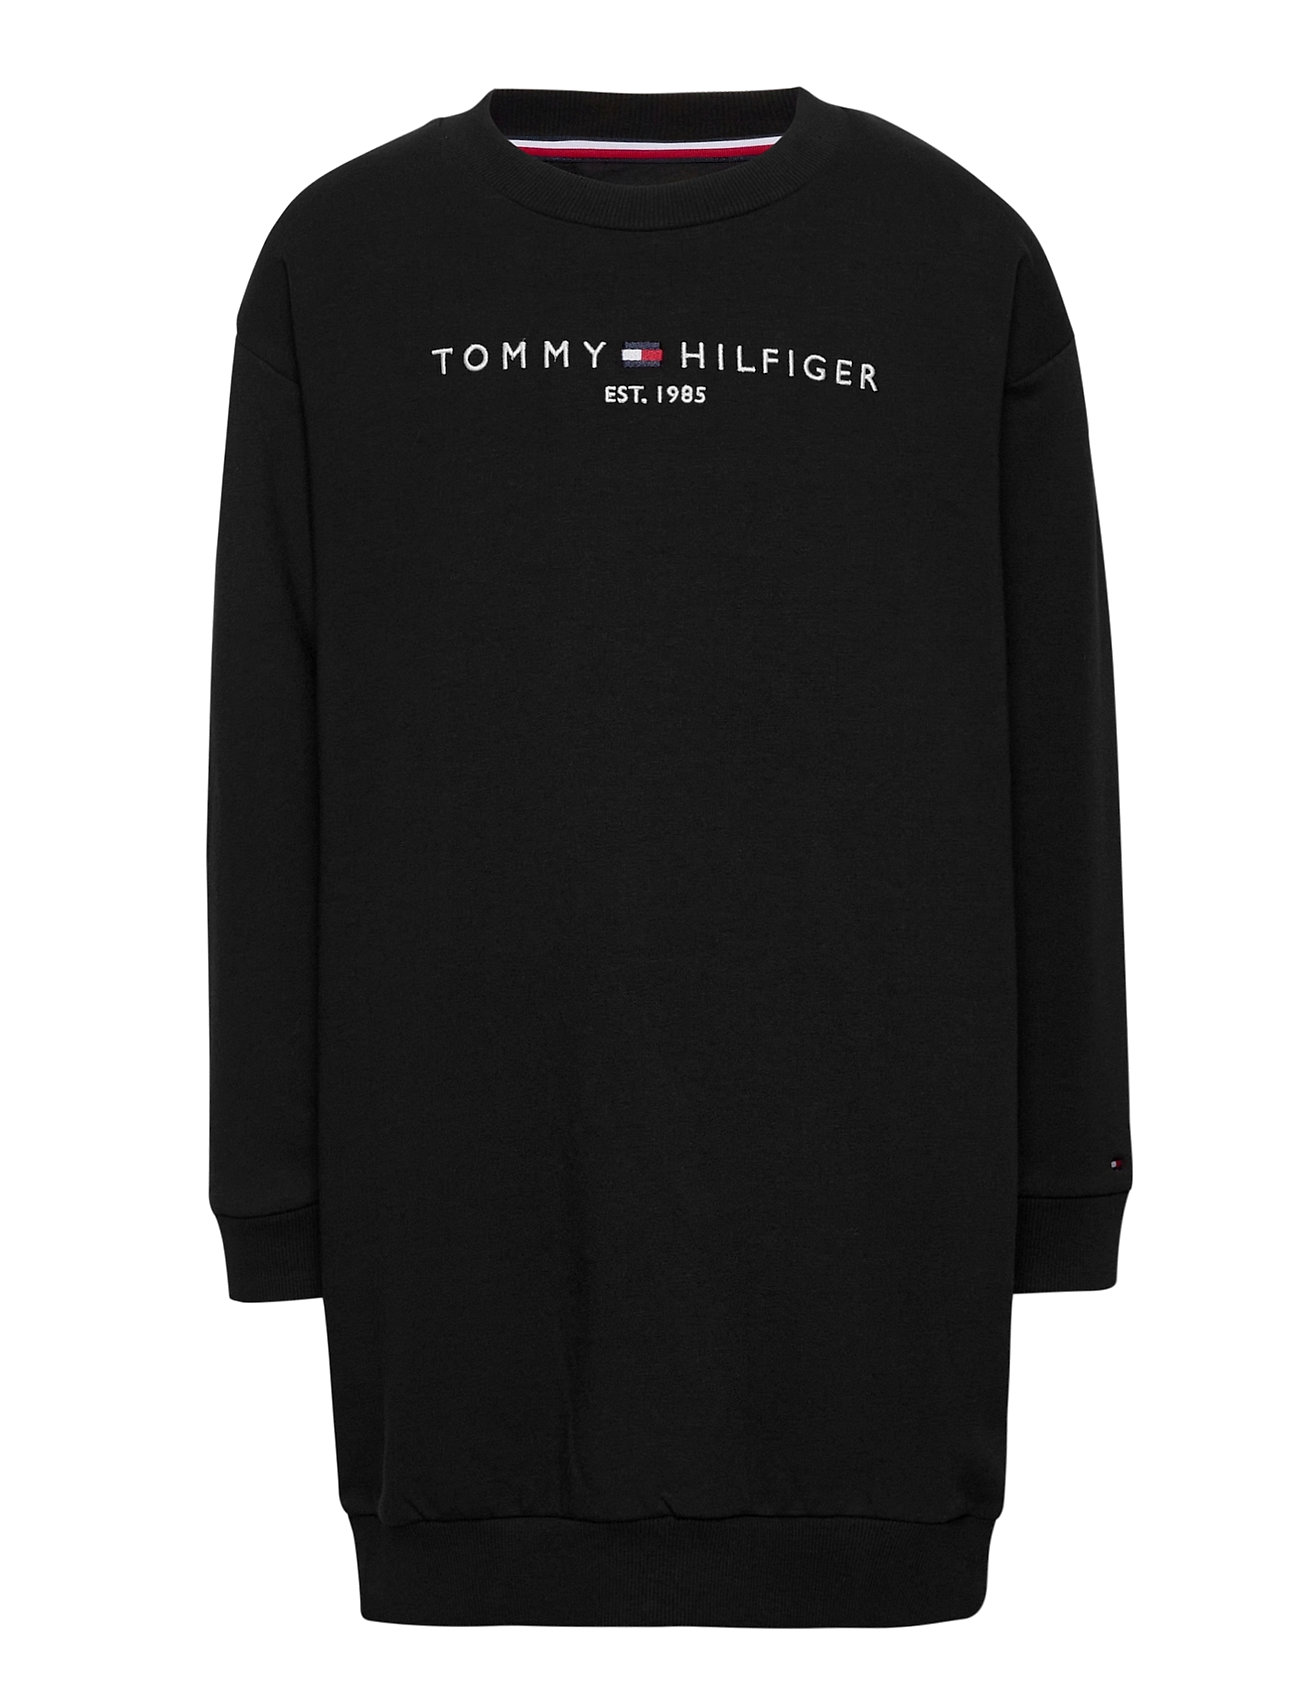 Image of Essential Sweat Dres Sweatshirt Trøje Sort Tommy Hilfiger (3489025595)